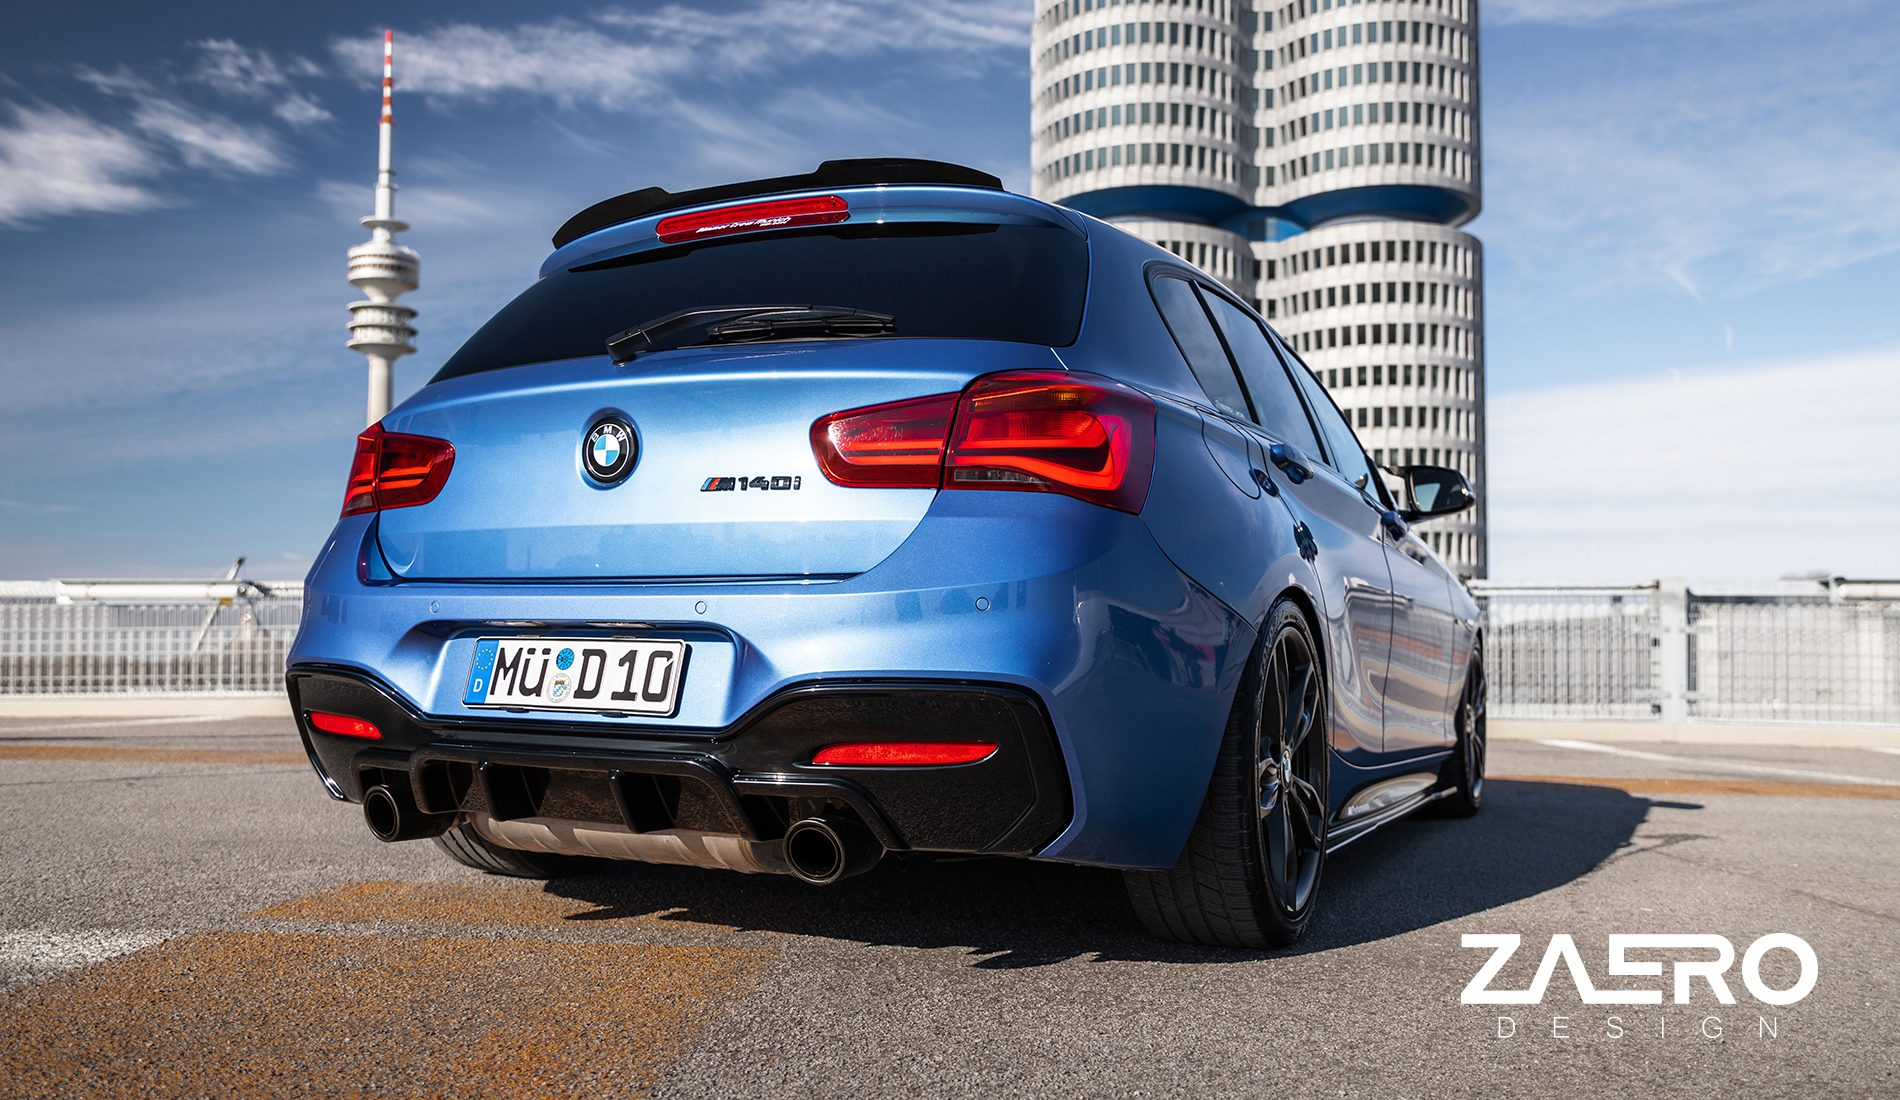 ZAERO-DESIGN-EVO-1-DIFFUSOR-FÜR-BMW-1ER-M135-M140-F20-F21-HECKDIFFUSOR-SPOILER-BODYKIT